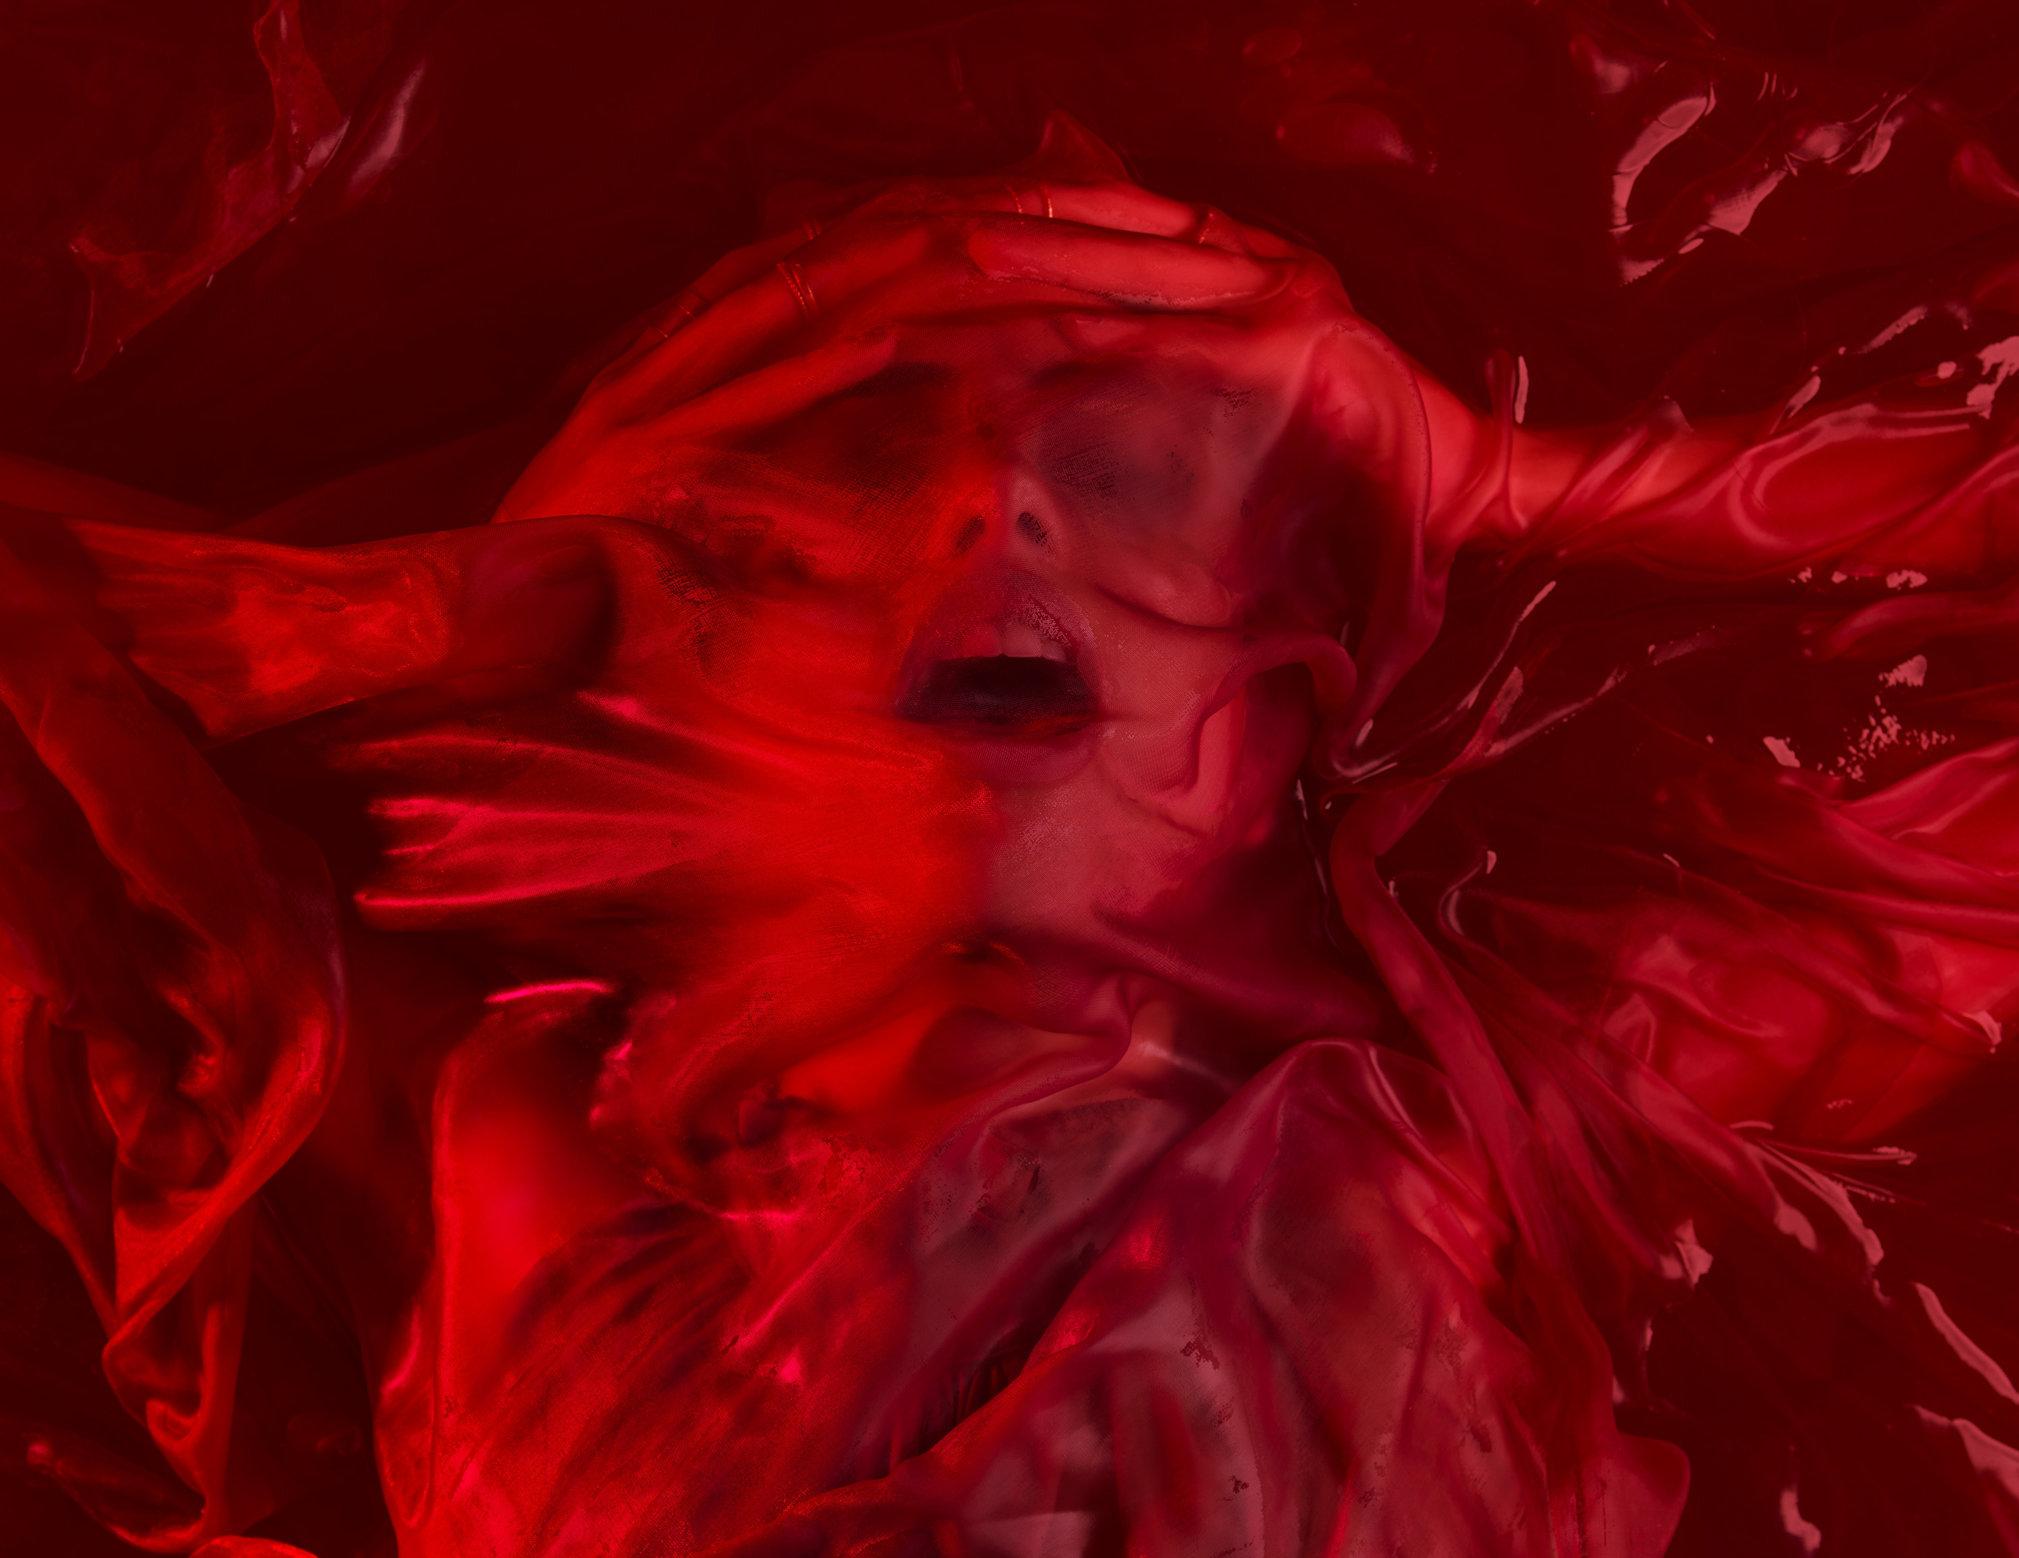 bloodflows